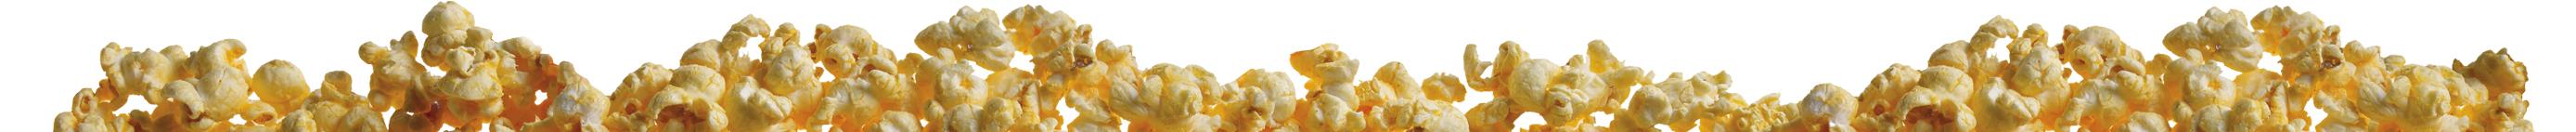 tws-popcorn.jpg